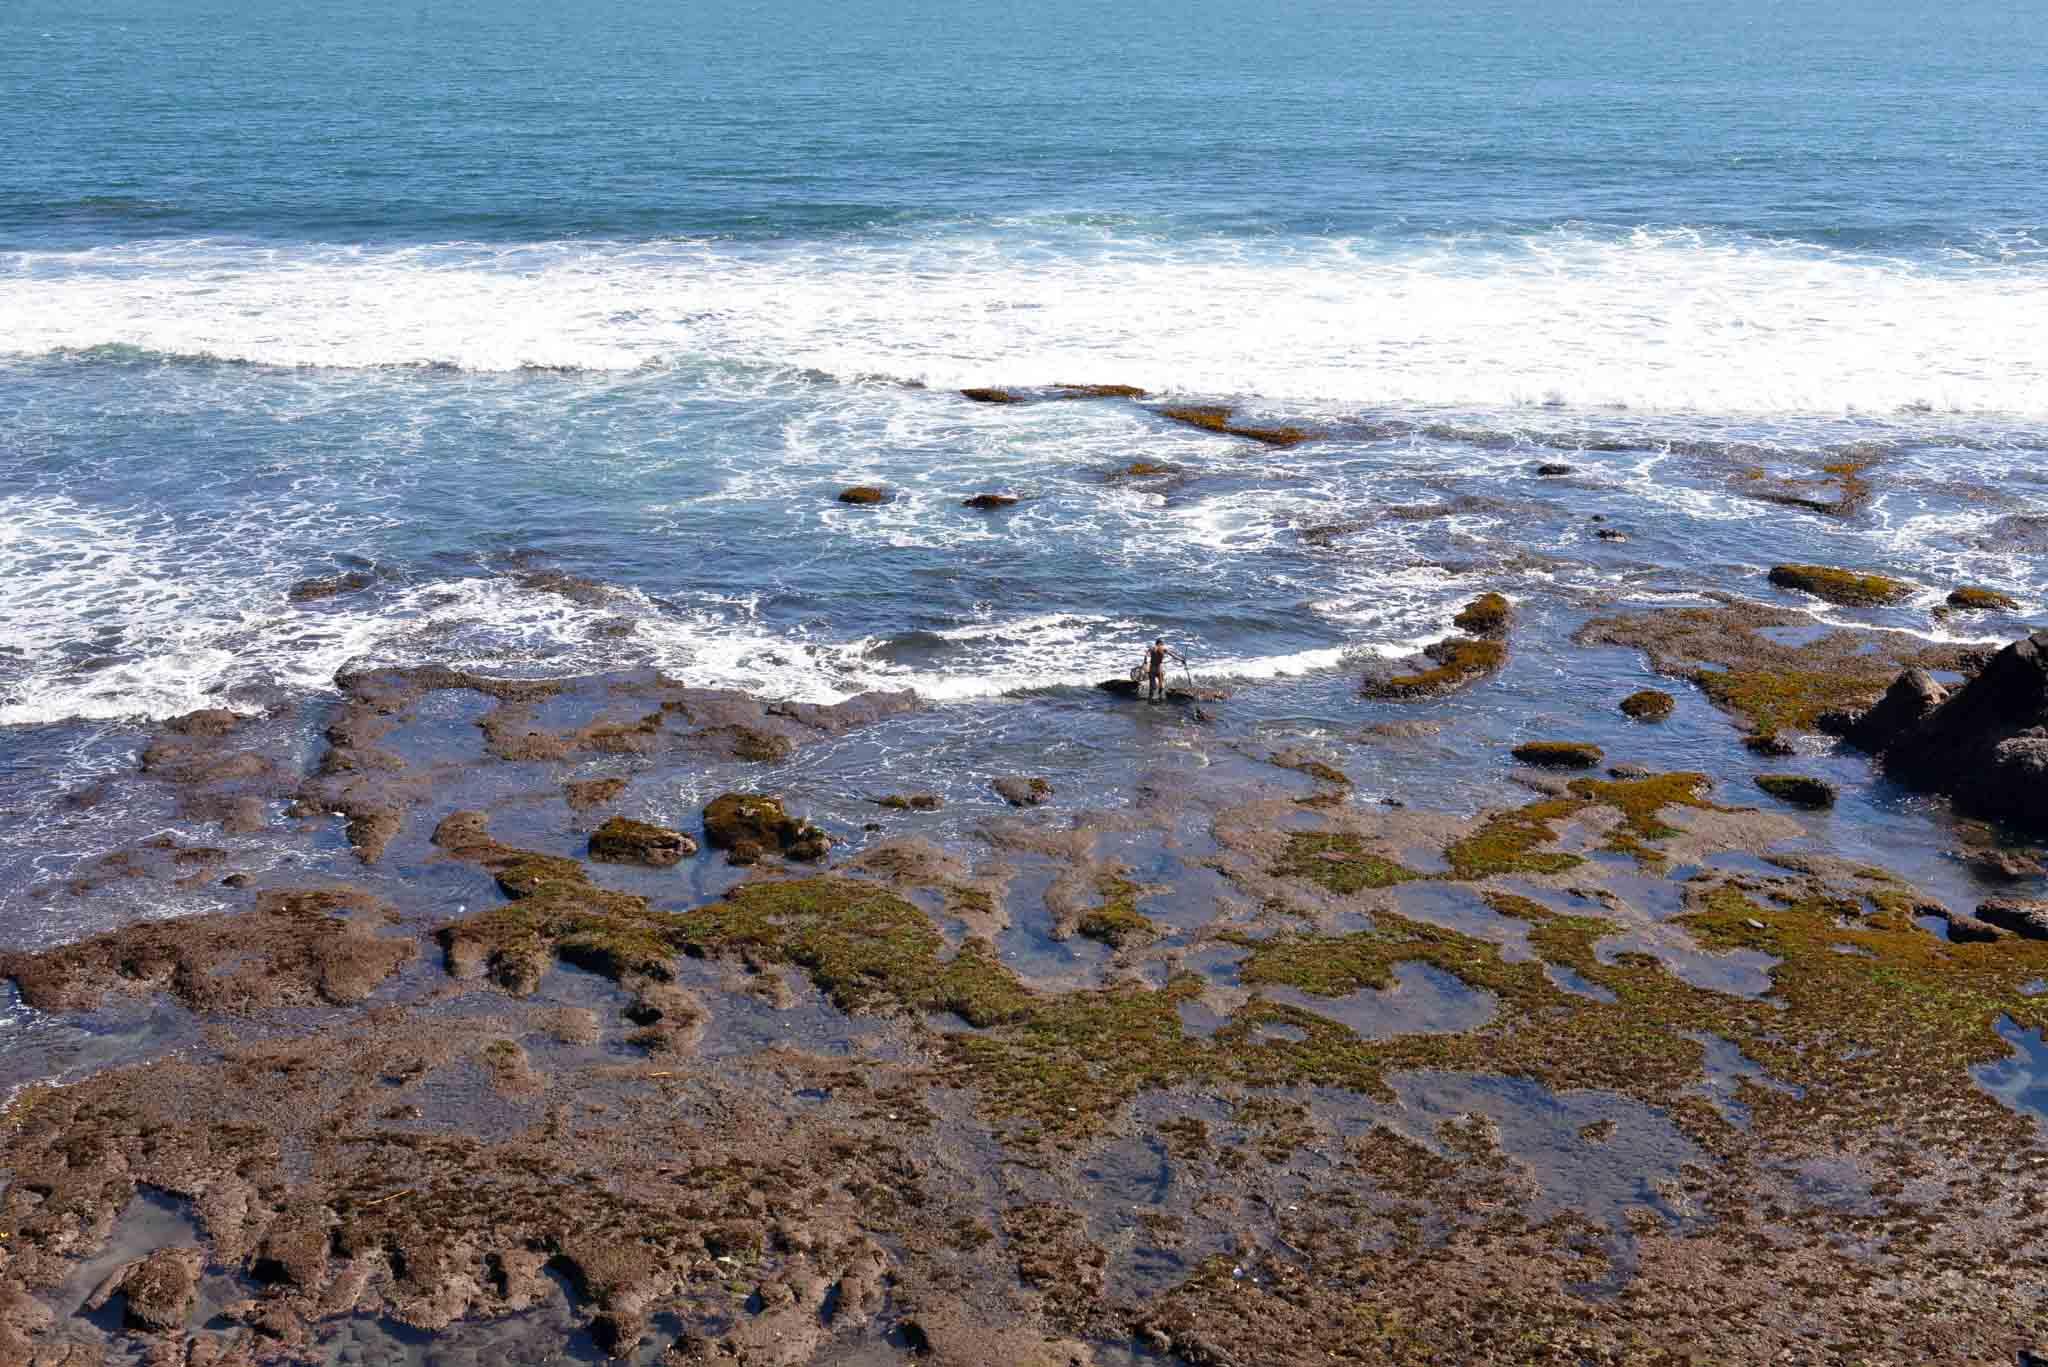 Lone Fisherman at lowtide, bali